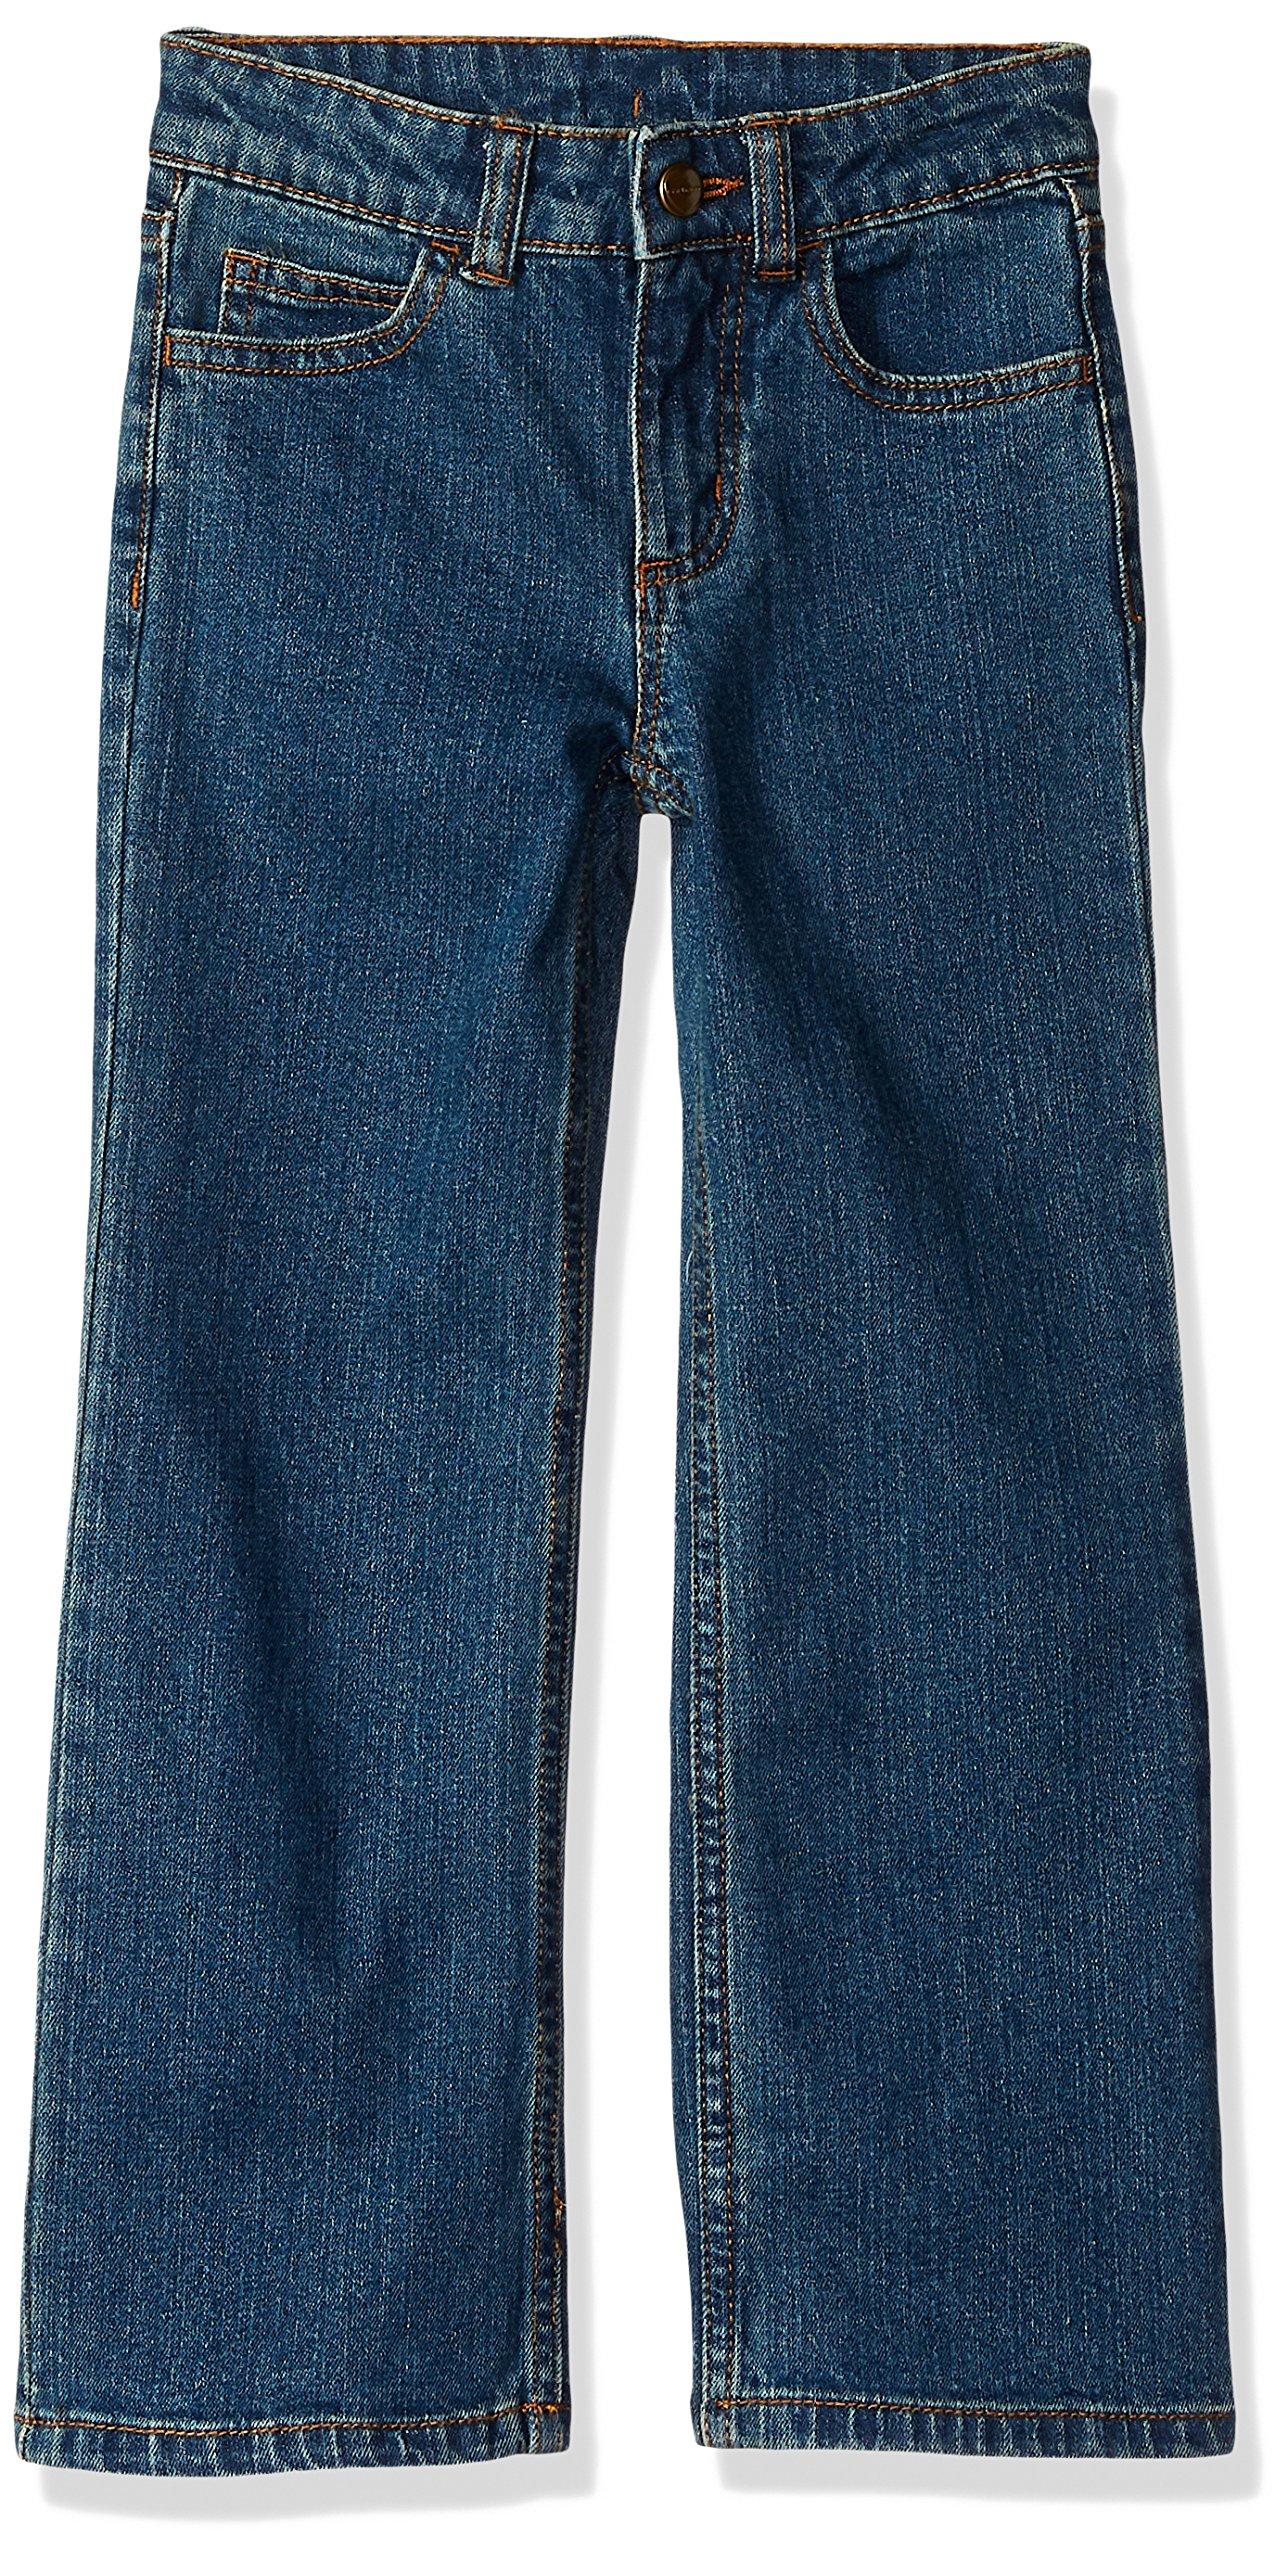 Carhartt Big Girls' Denim 5 Pocket Jean, Medium Wash, 12